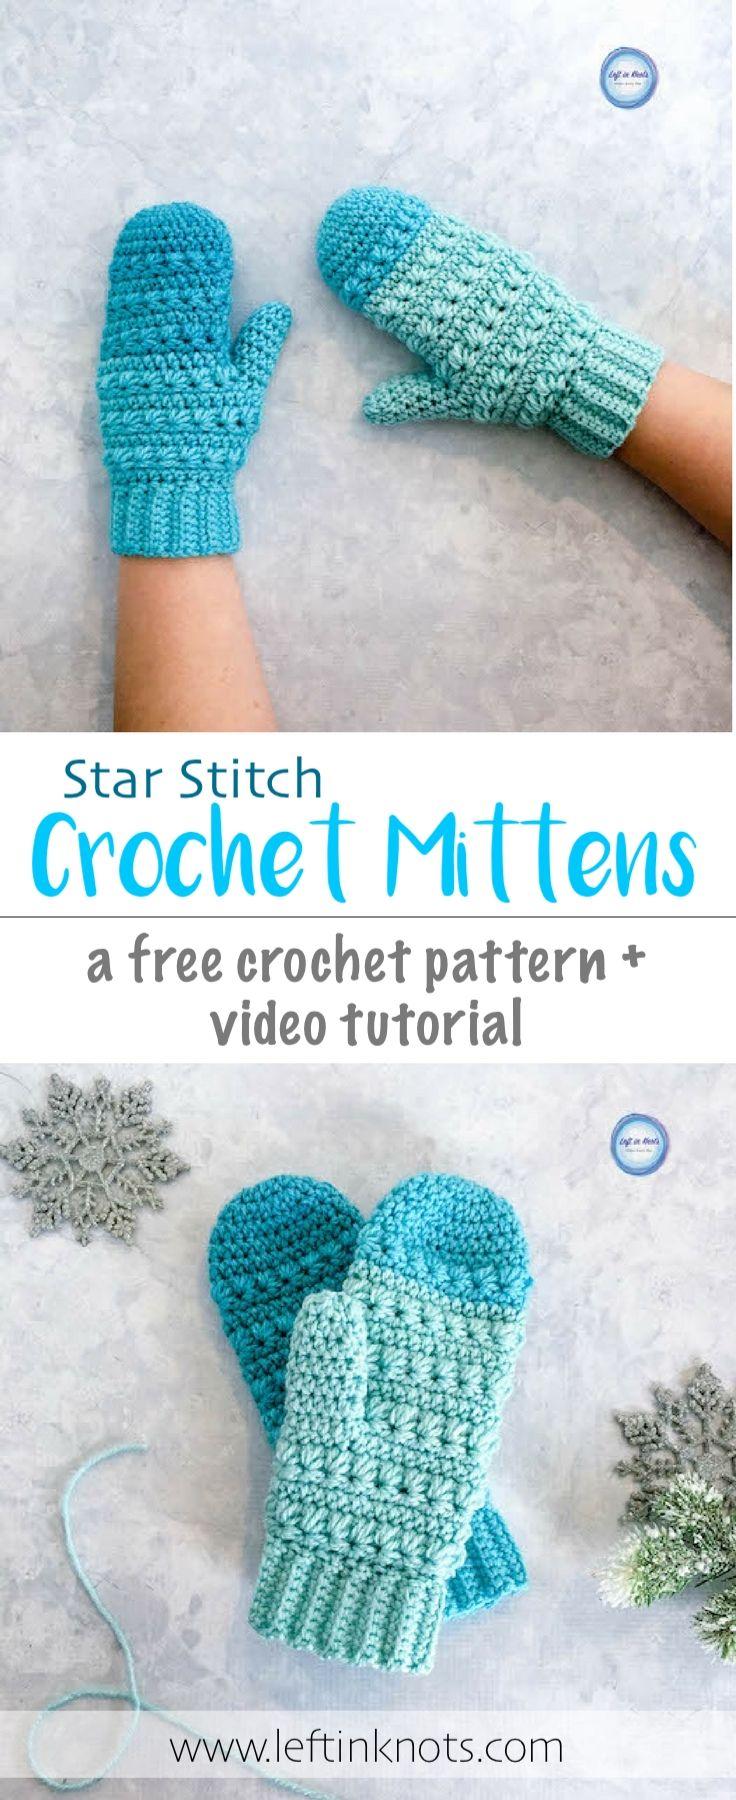 Snow Drops Mittens Free Crochet Pattern | Mitones, Mochilas wayuu y ...